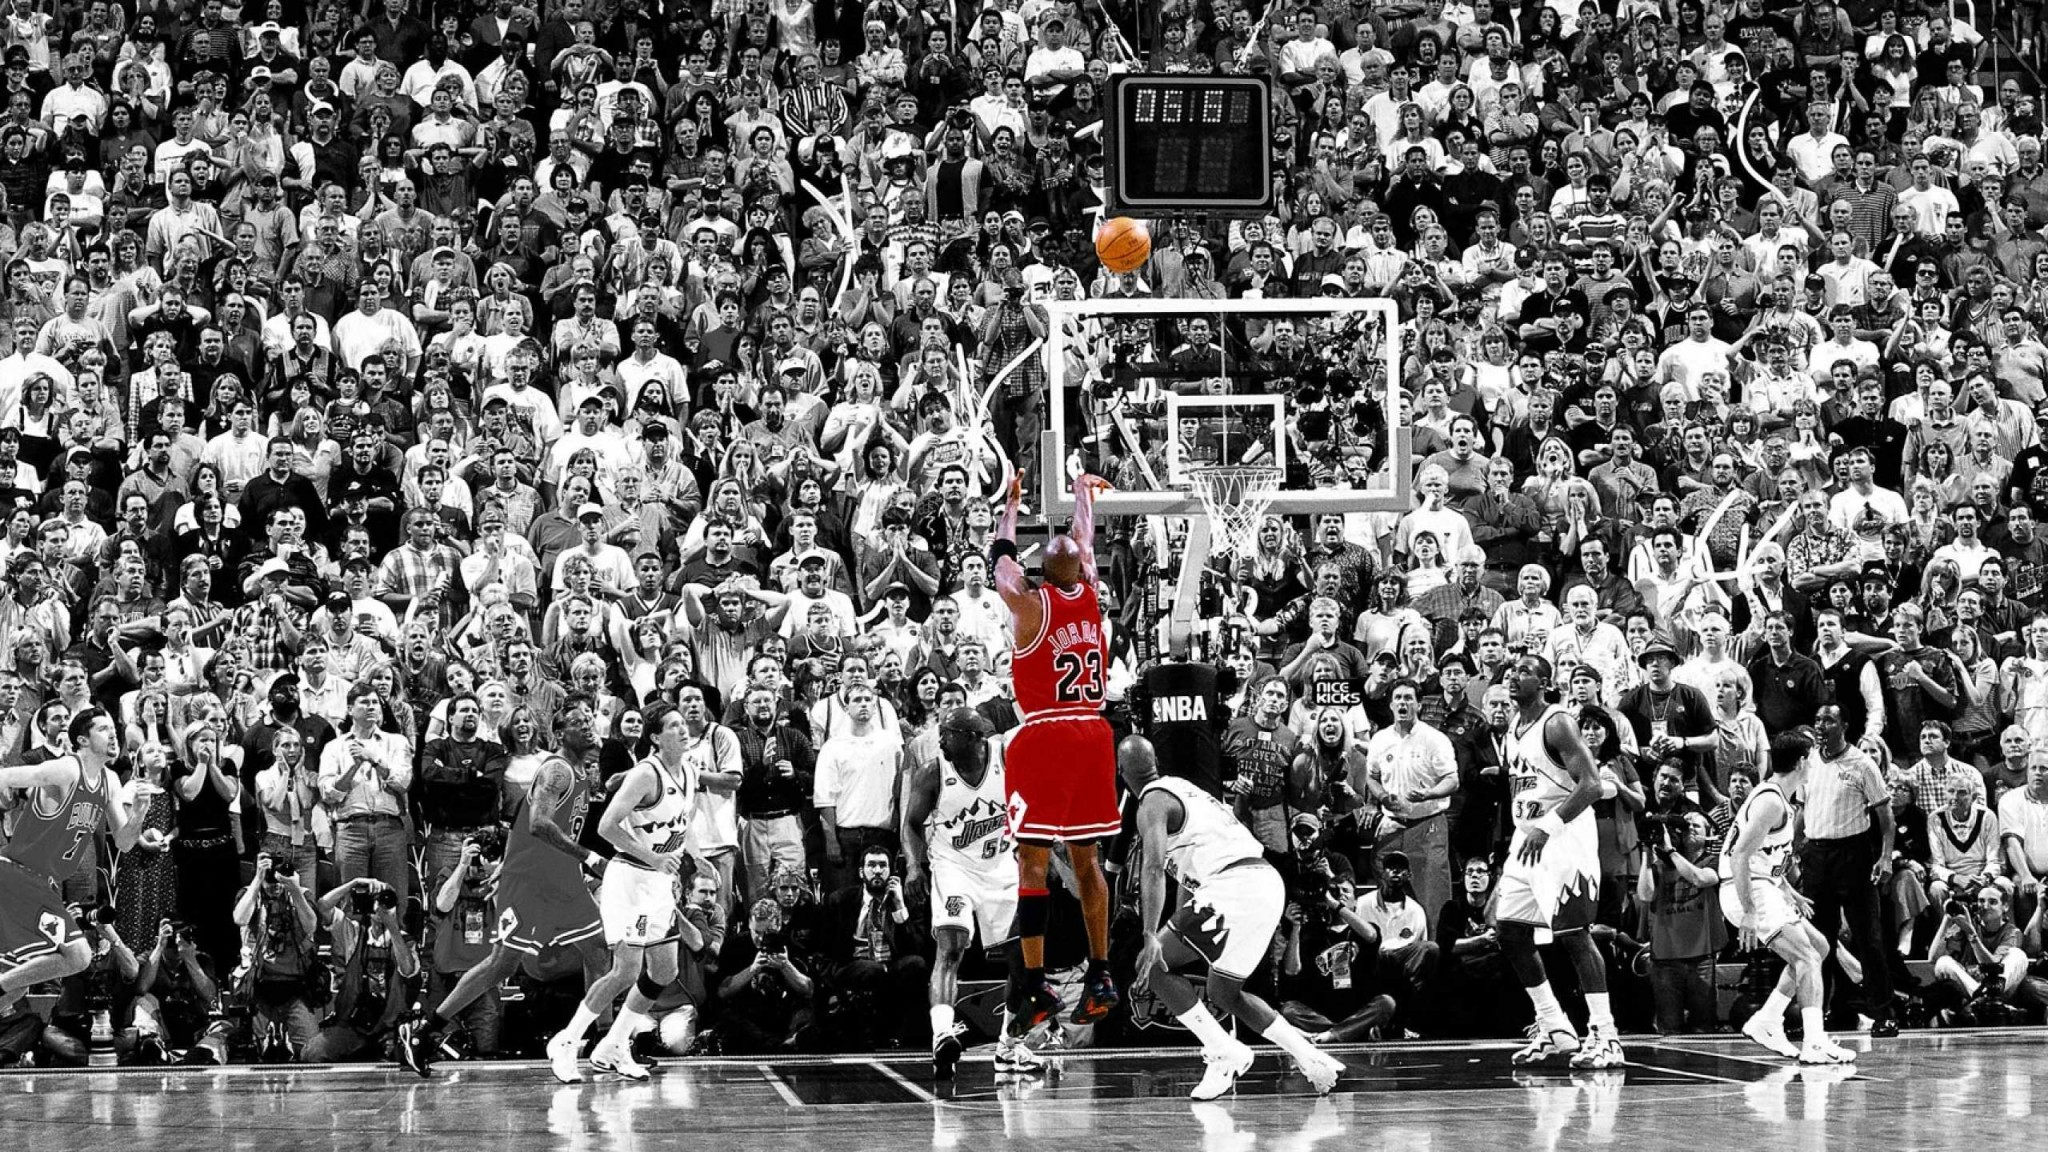 Nba Wallpaper - Michael Jordan Wallpaper 4k , HD Wallpaper & Backgrounds